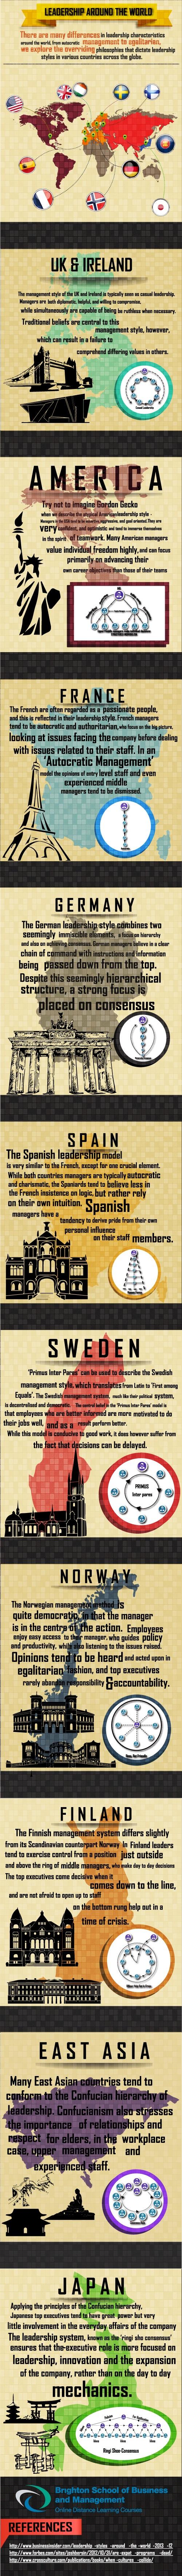 Leadership Styles Around the World - Brighton Infographic